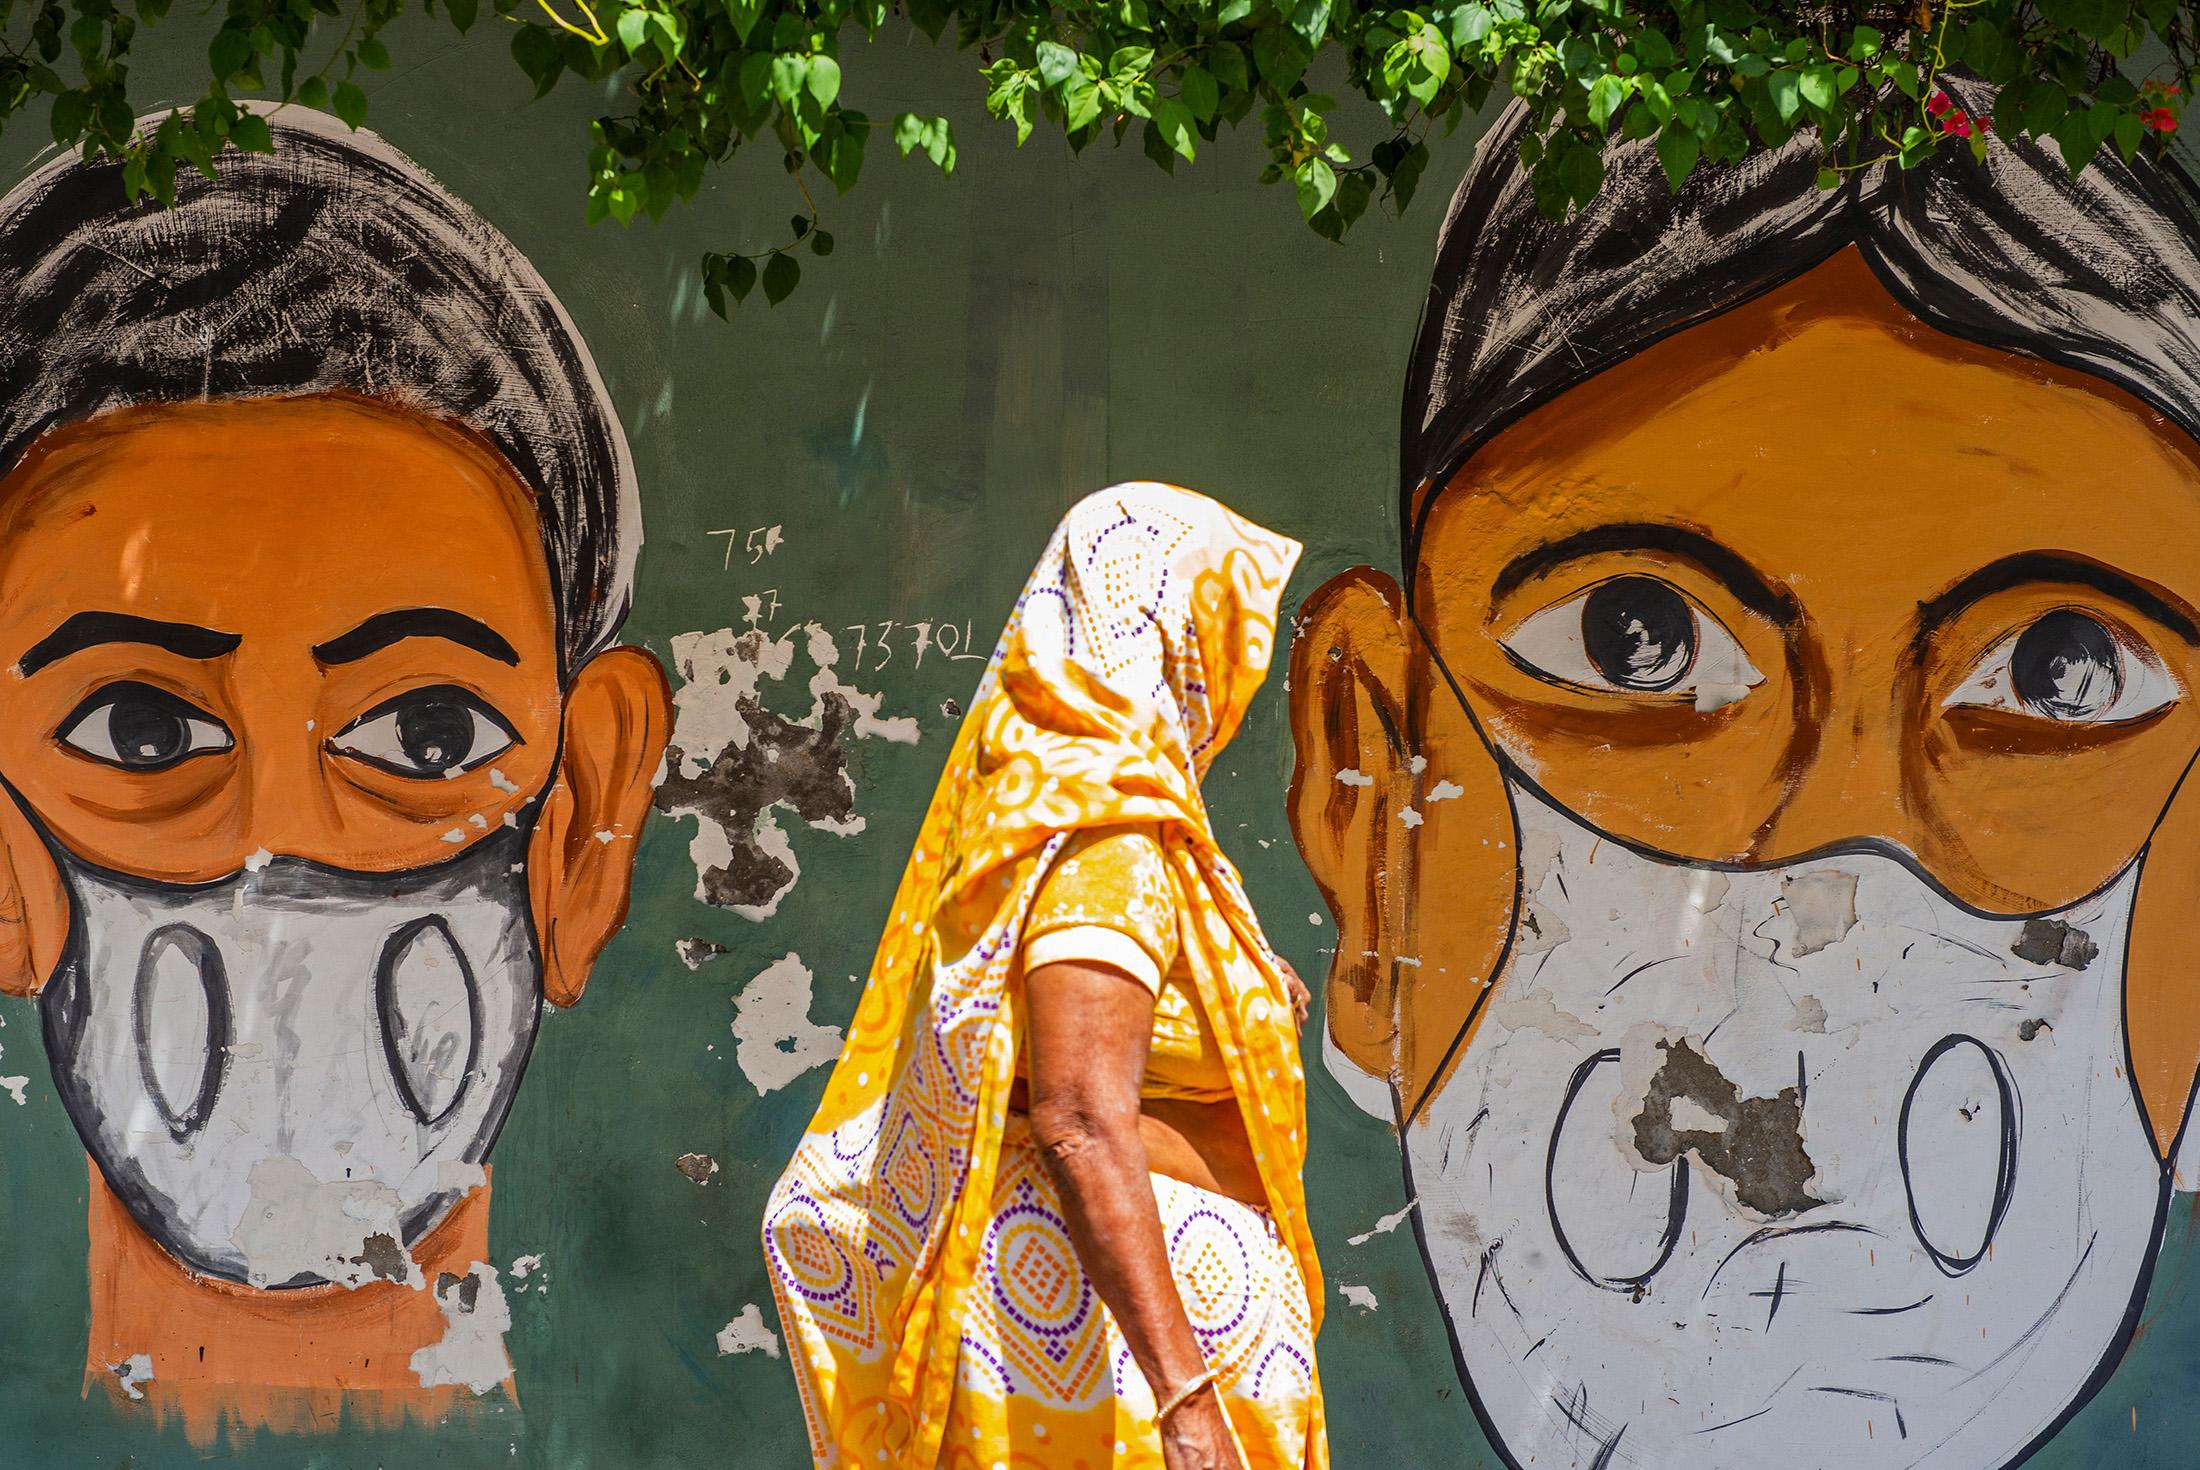 A Covid-19 awareness mural in New Delhi on April 2.